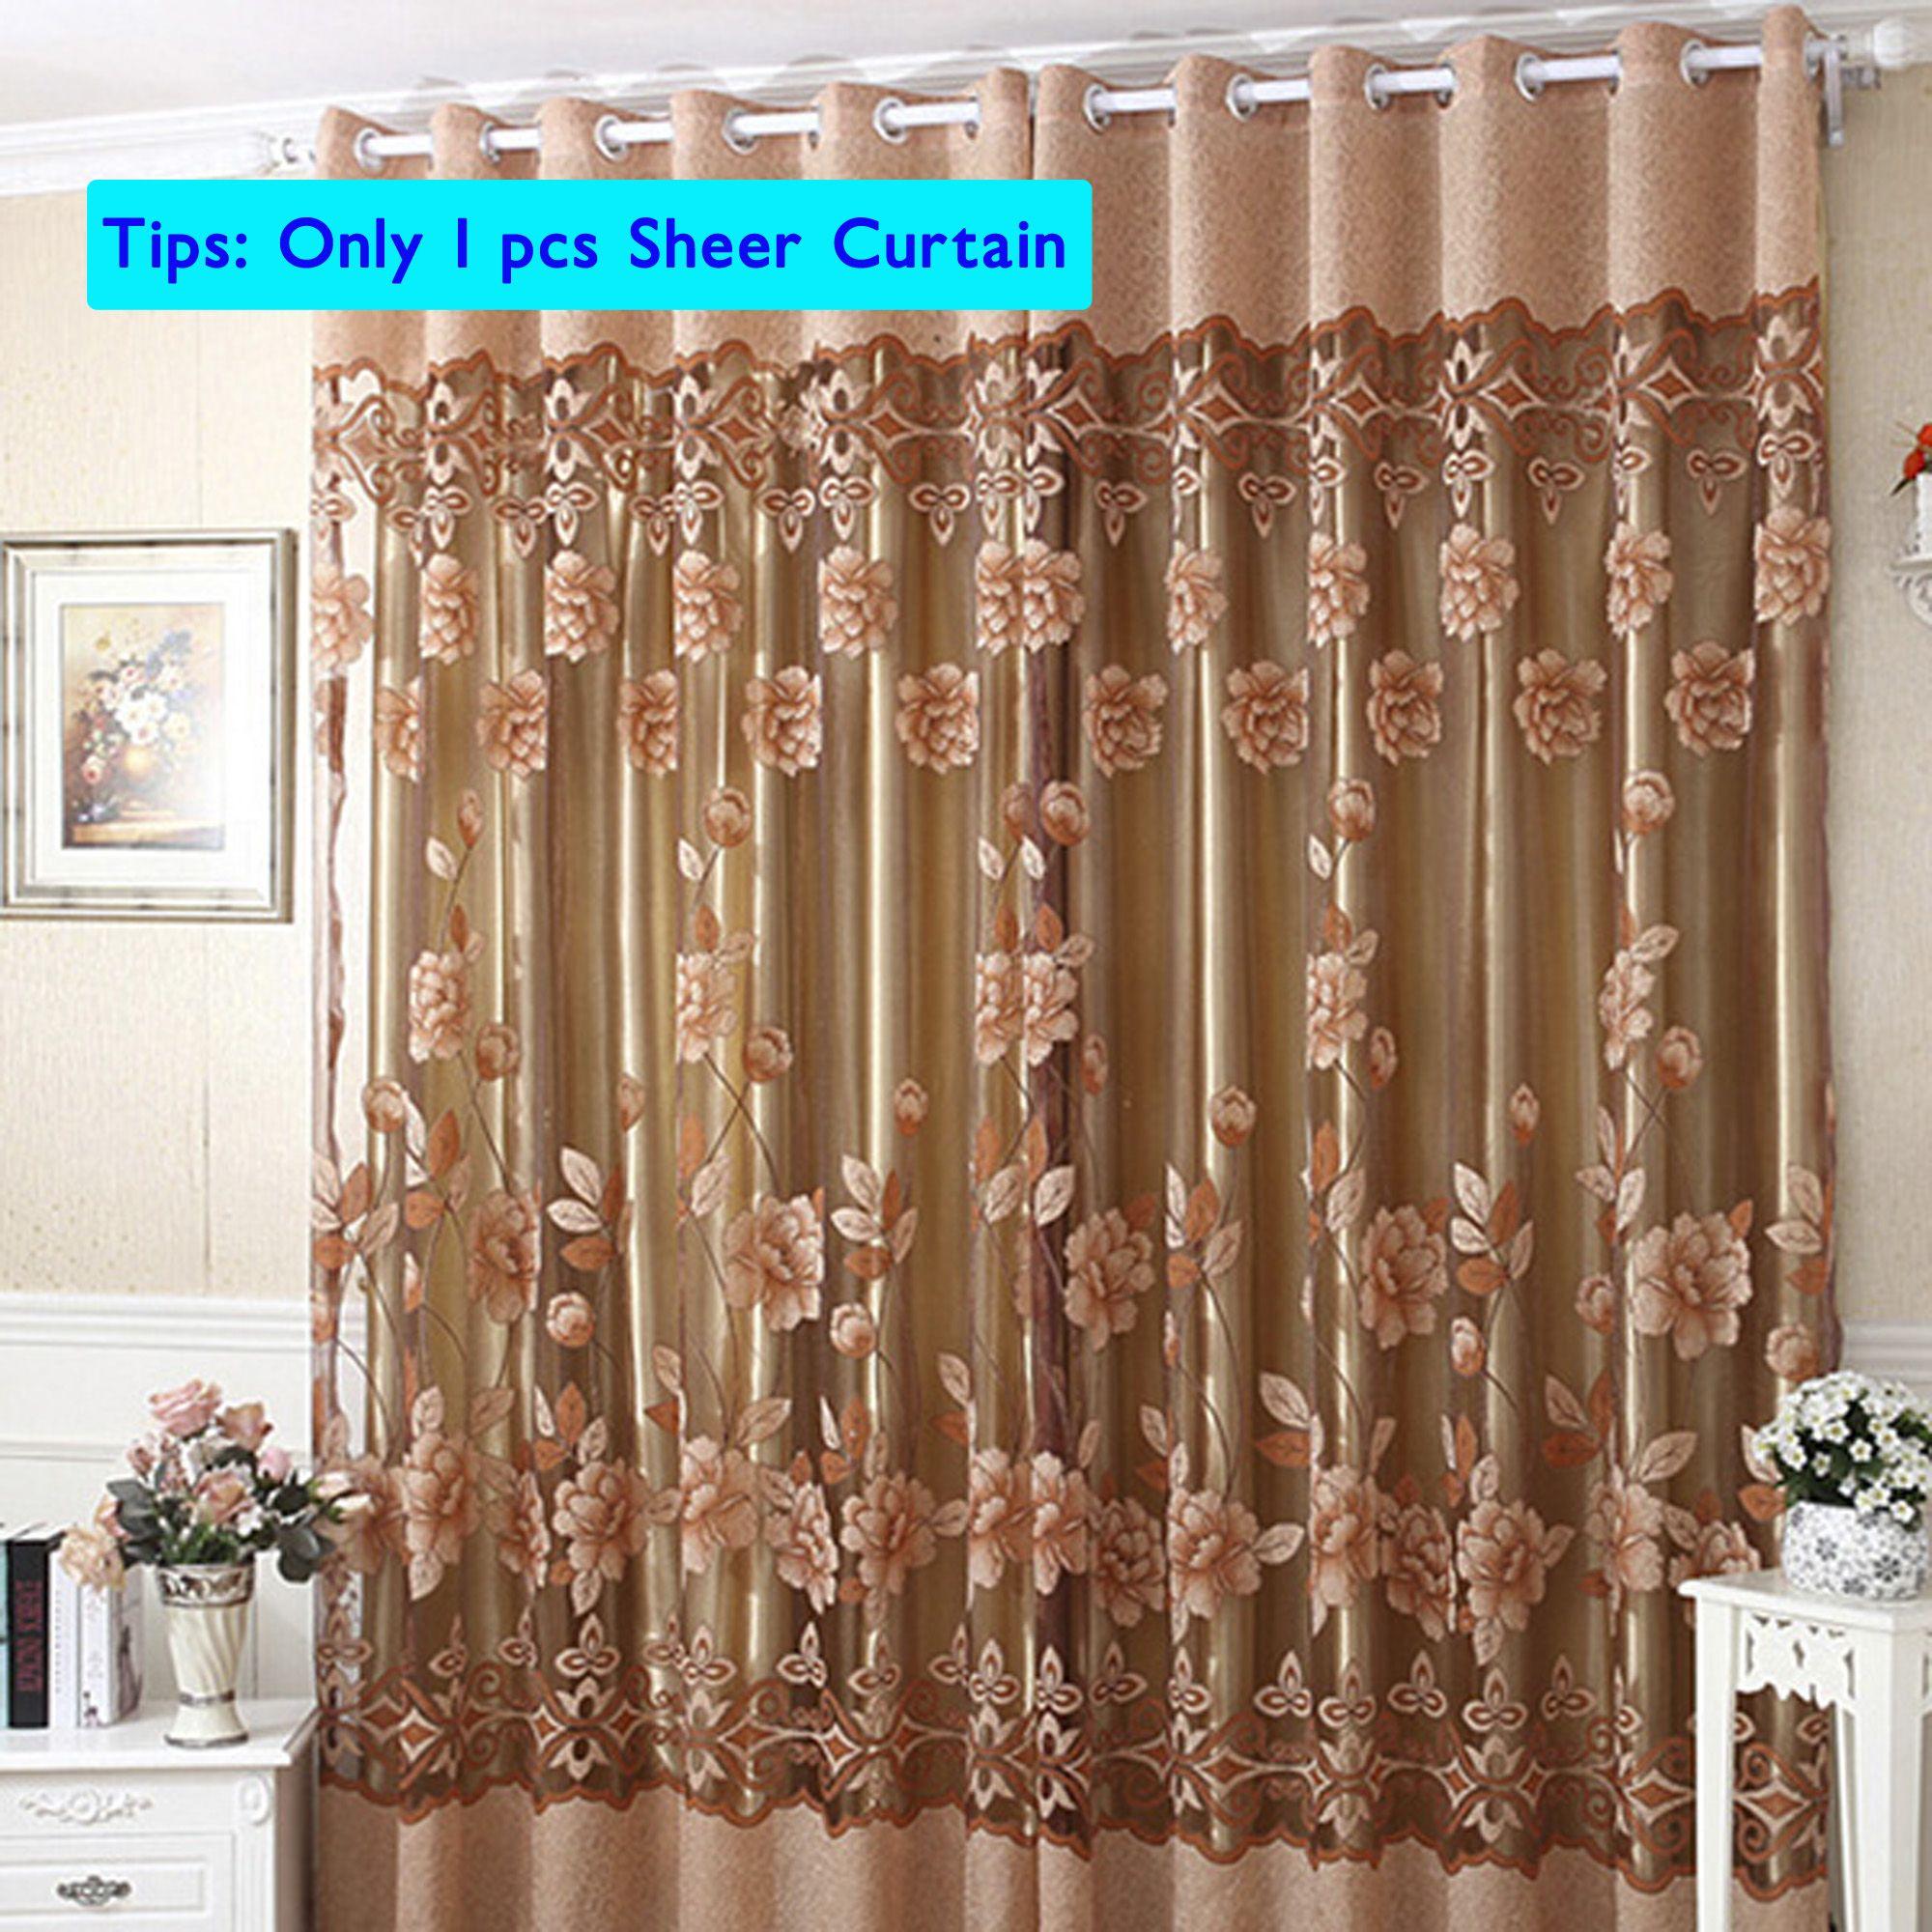 Nk Home Luxury Floral Tulle Door Window Curtain Drape Panel Sheer Scarf Valances Divider Room Decorative 1x2 5m Purple Pink Walmart Com Window Curtains Curtains Curtain For Door Window